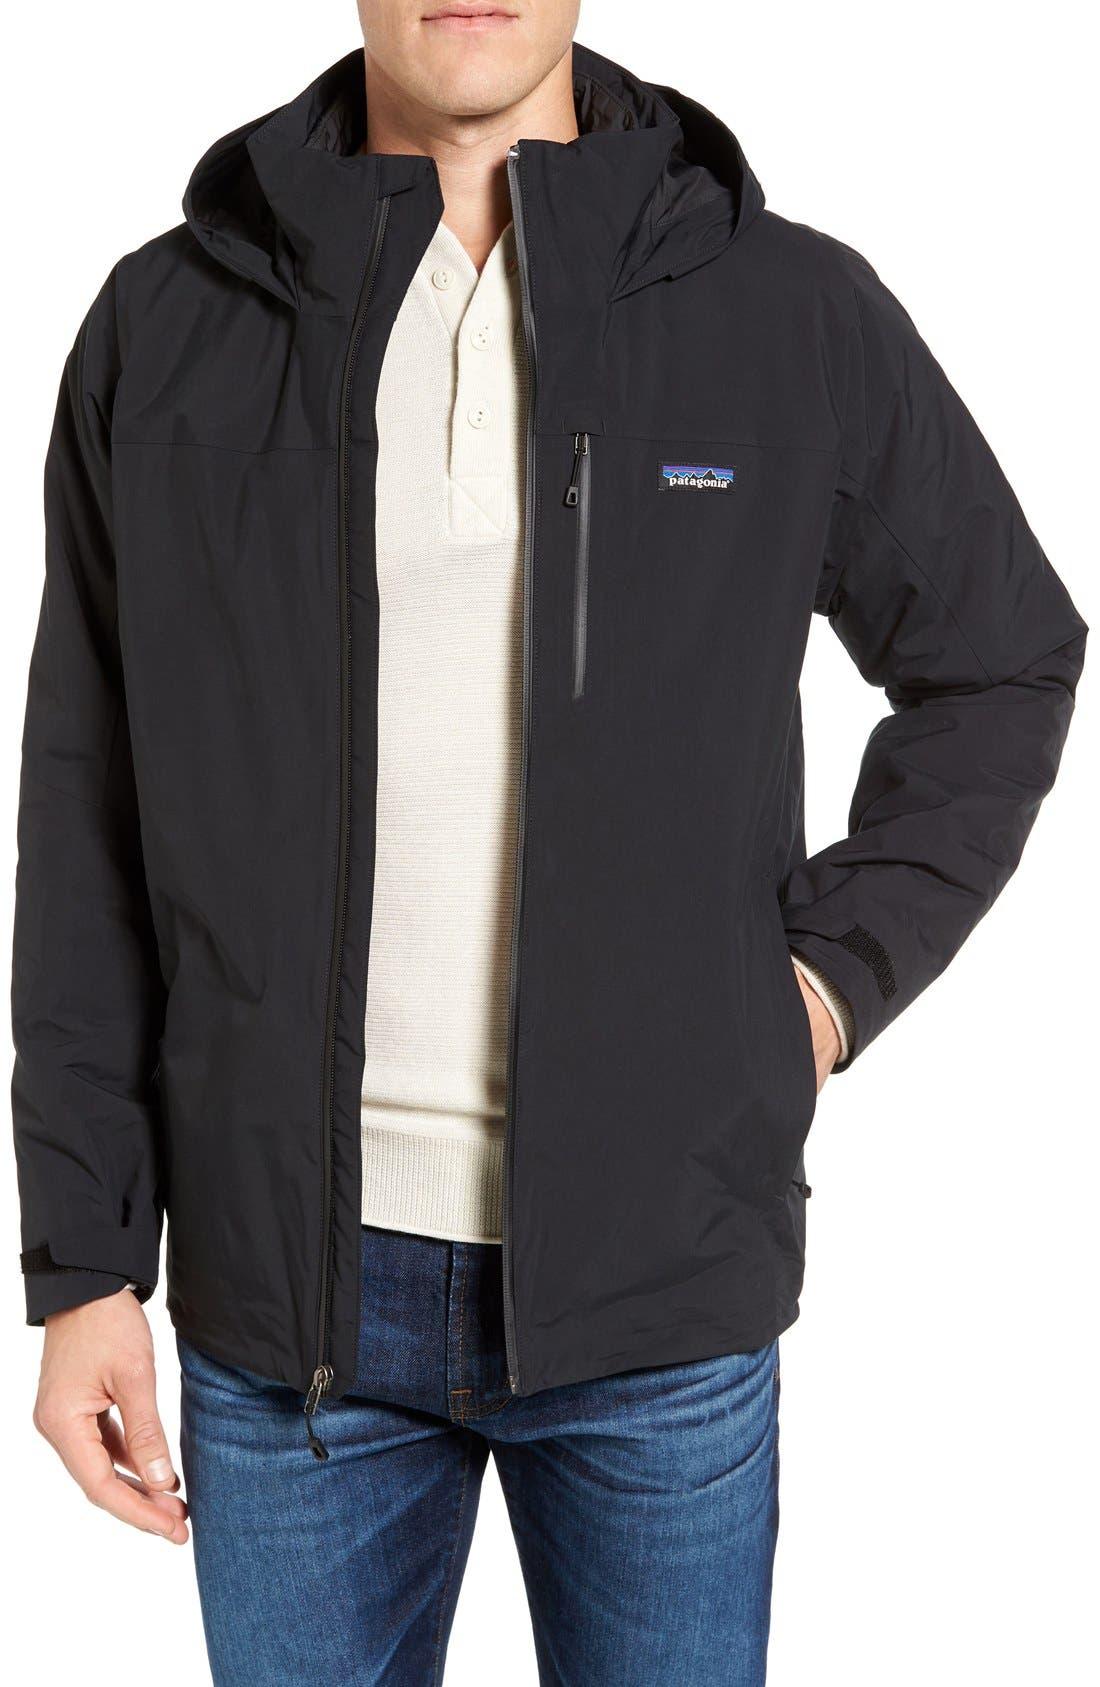 Windsweep 3-in-1 Jacket,                         Main,                         color, Black